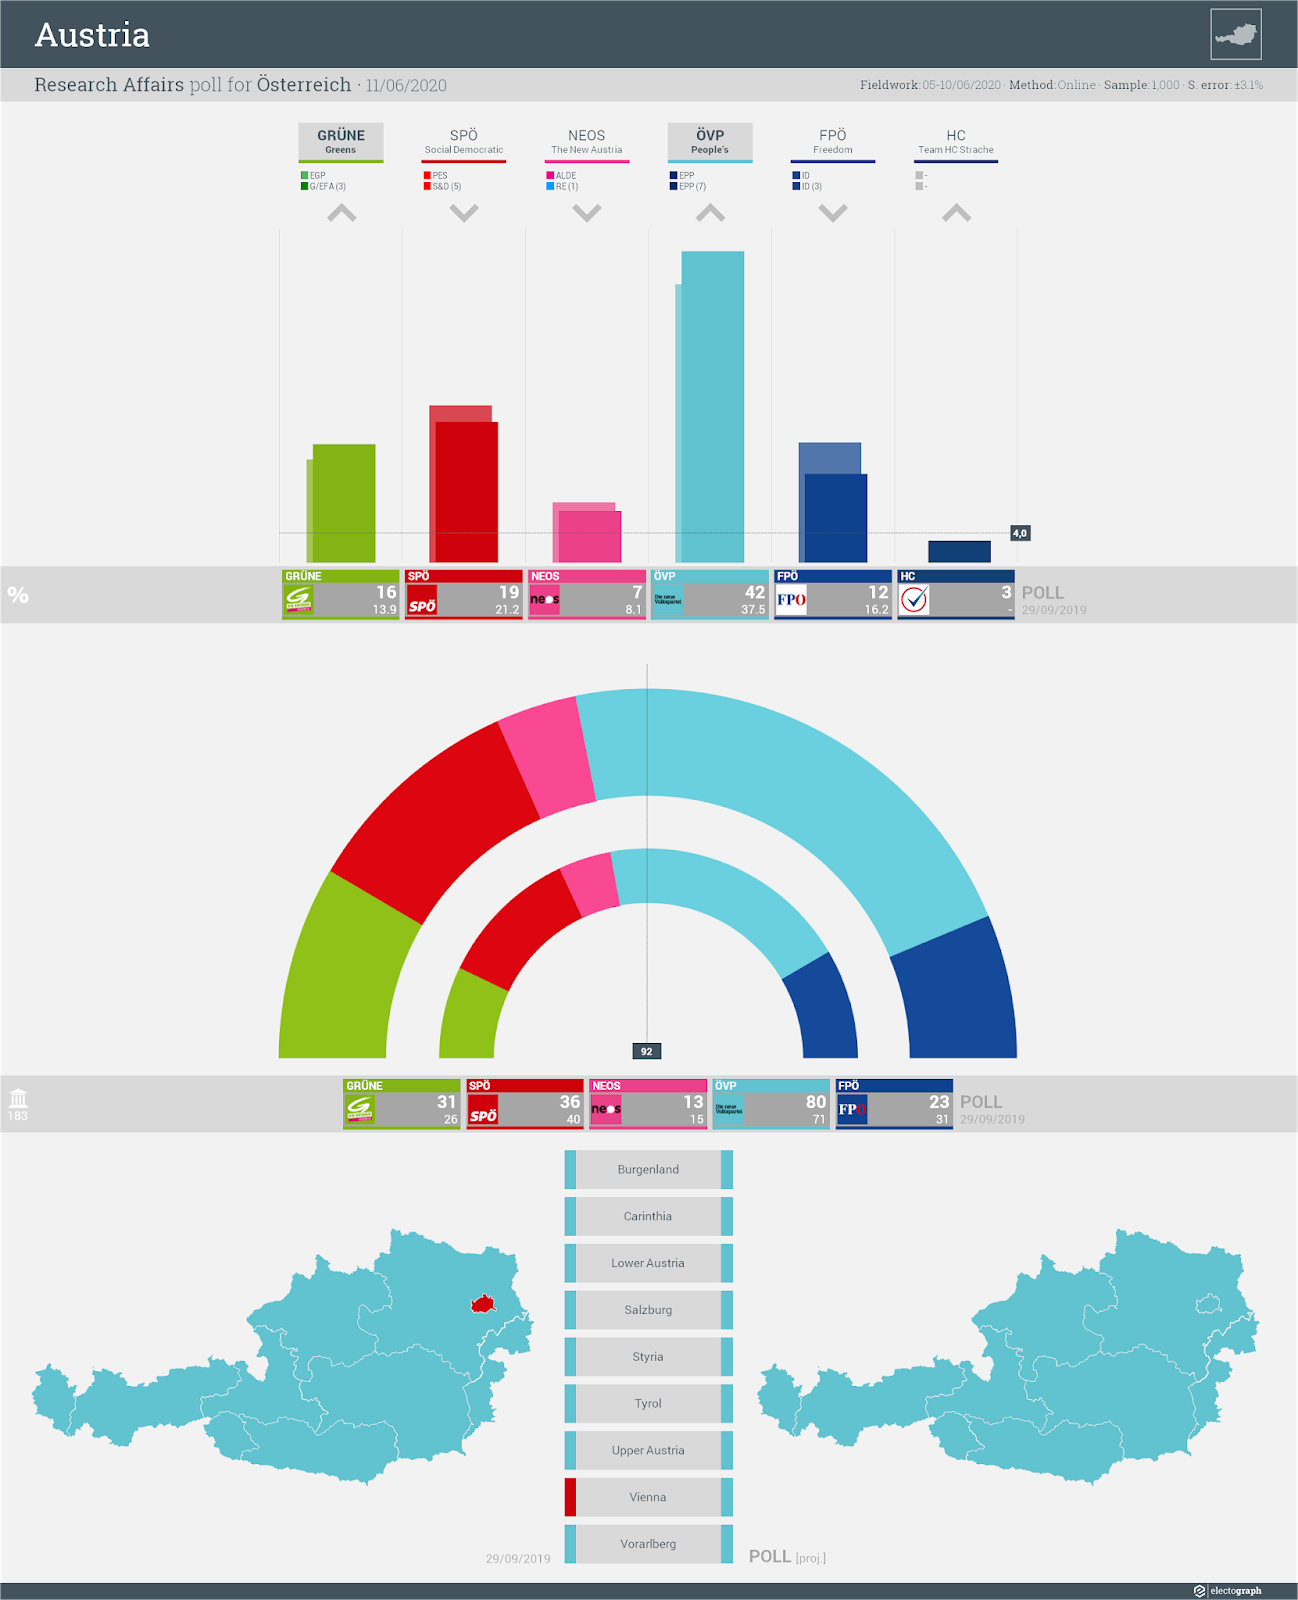 AUSTRIA: Research Affairs poll chart for Österreich, 12 June 2020